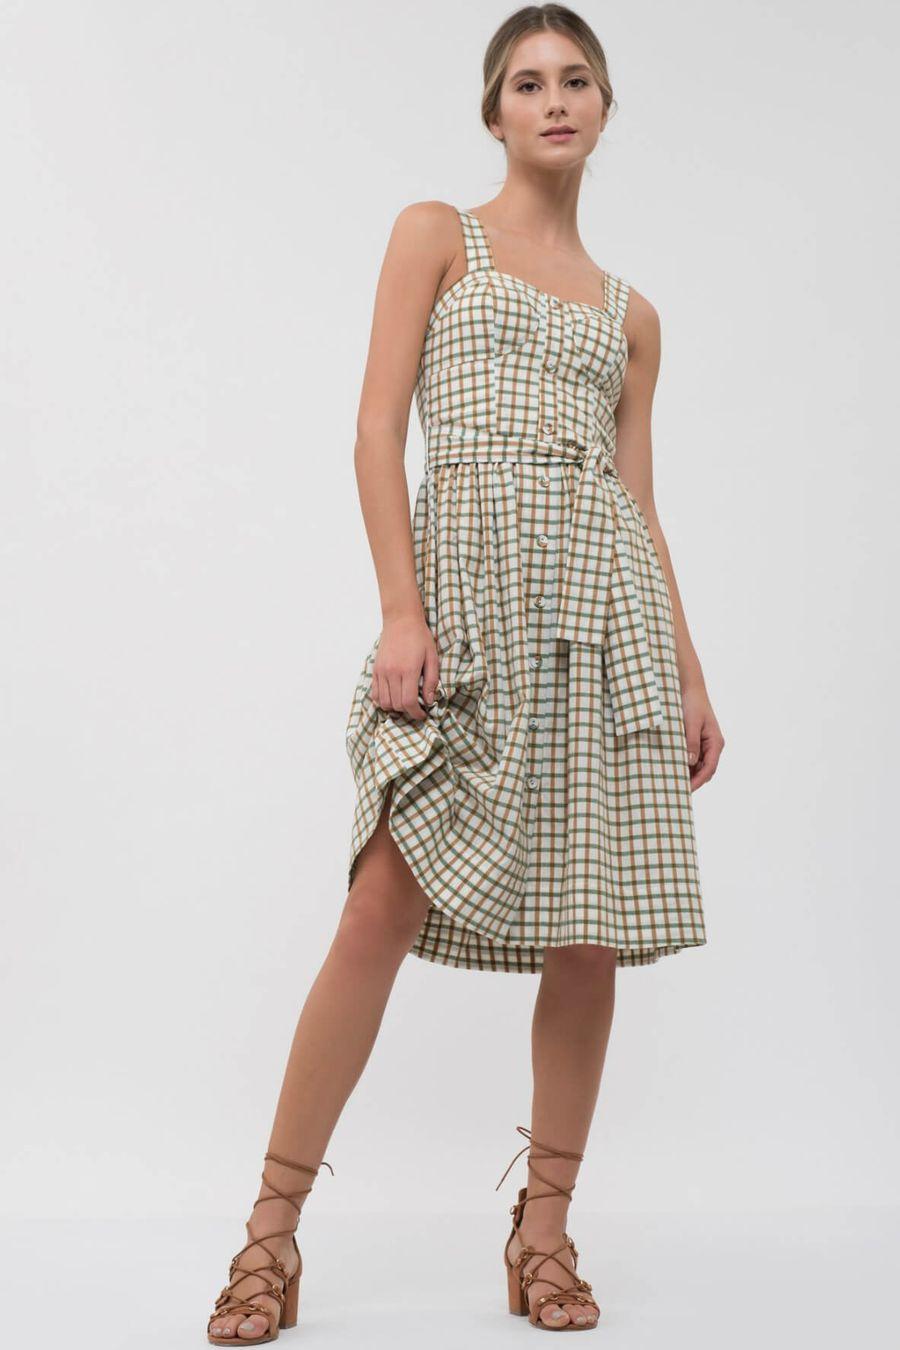 joa-button-up-midi-dress-3